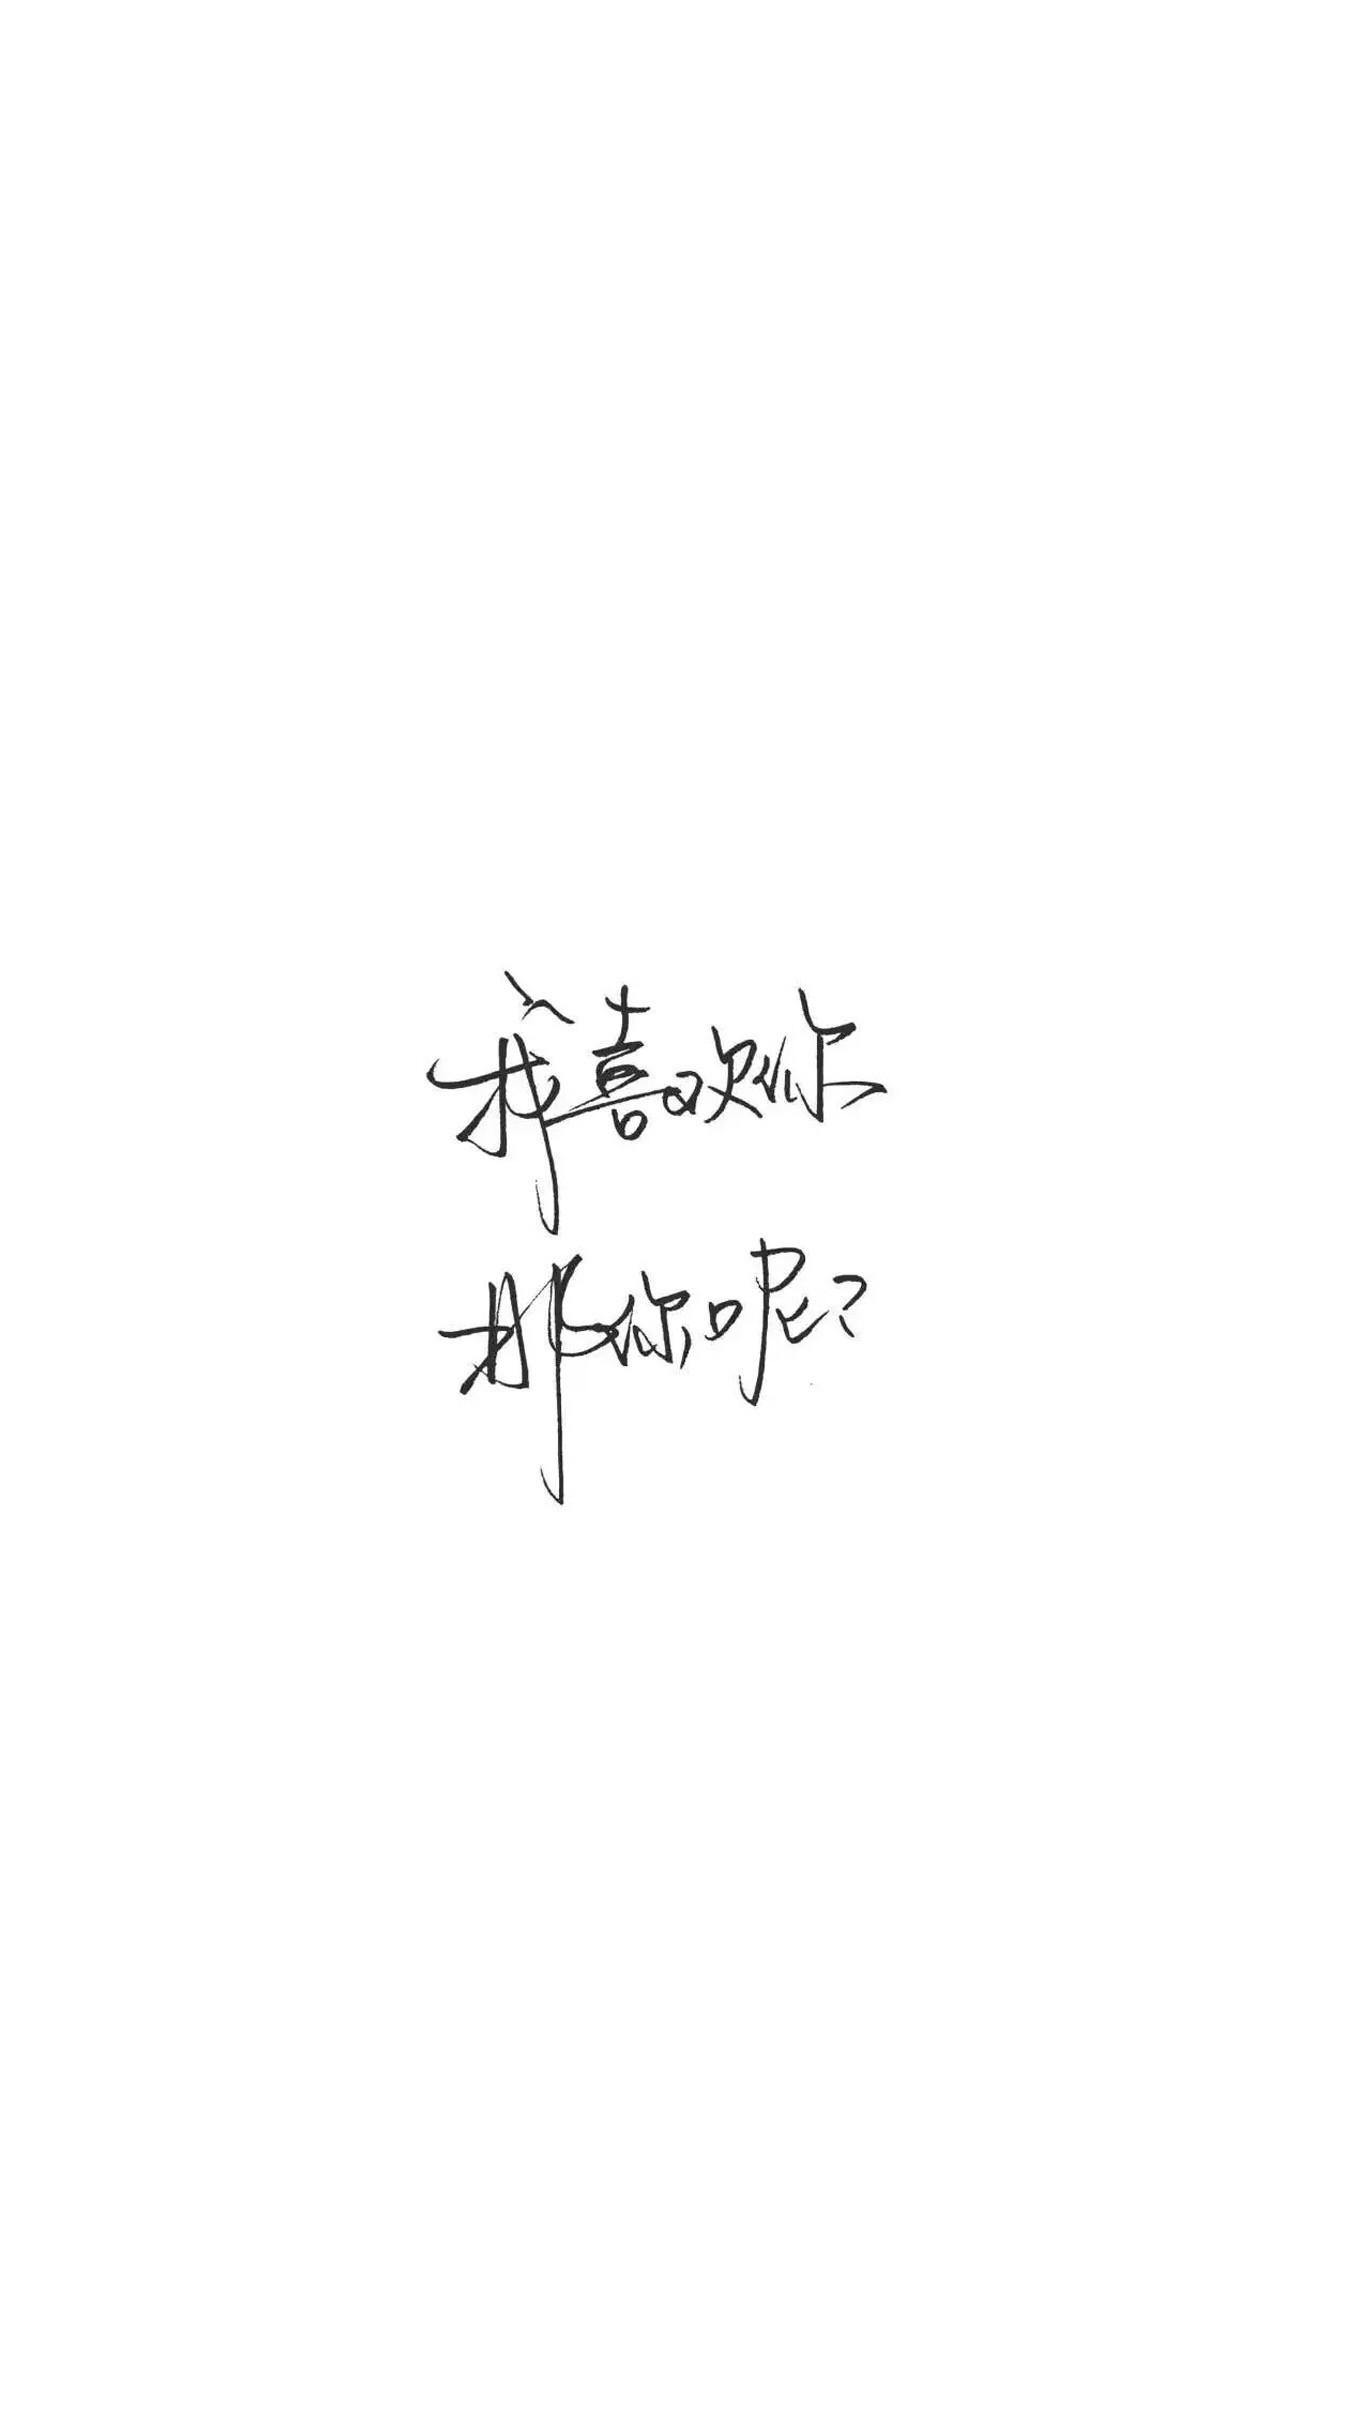 【v粉主题素材壁纸】伤感爱情文字语录【9p】